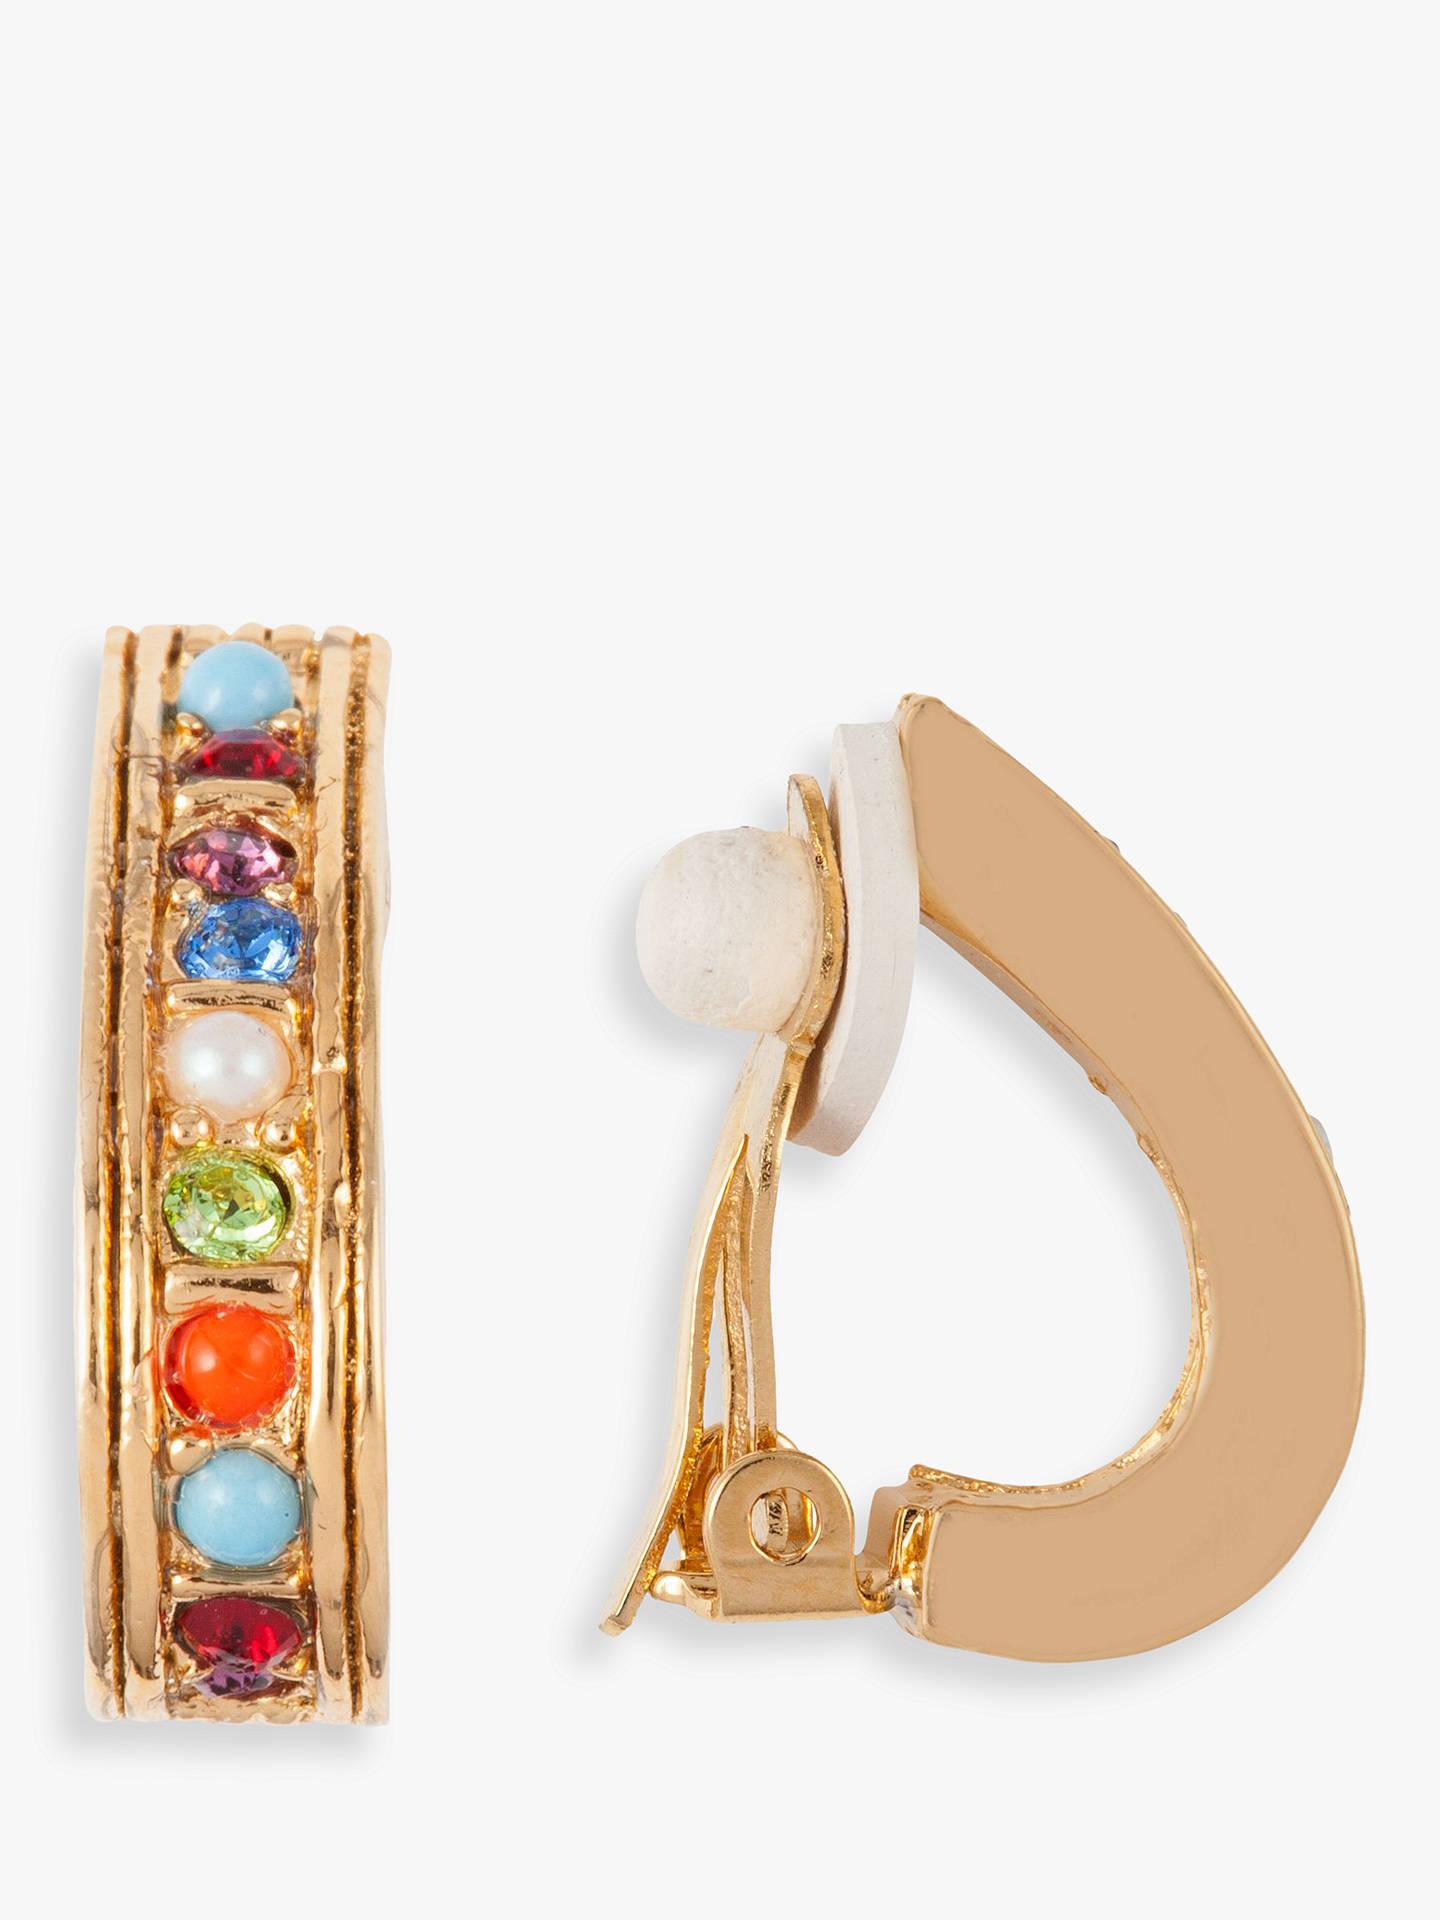 Susan Caplan Vintage D Orlan 22ct Gold Plated Faux Pearl And Swarovski Crystal Demi Hoop